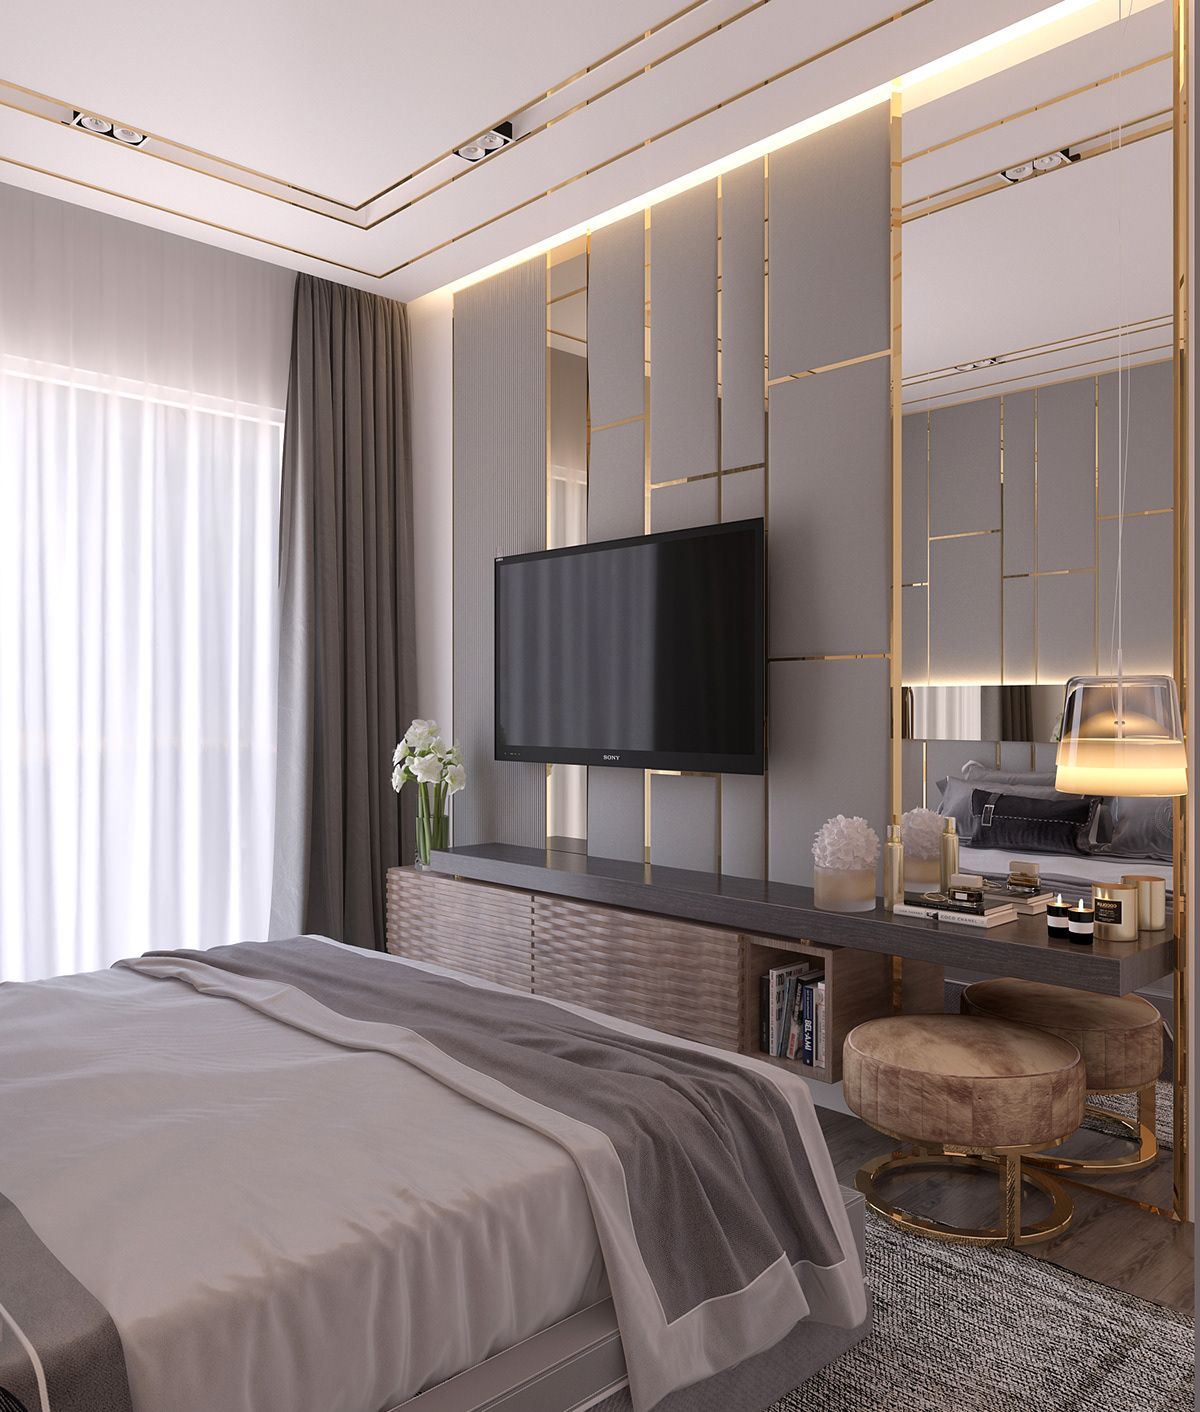 Modern Style Bedroom Dubai Project On Behance Modern Style Bedroom Luxurious Bedrooms Contemporary Bedroom Design